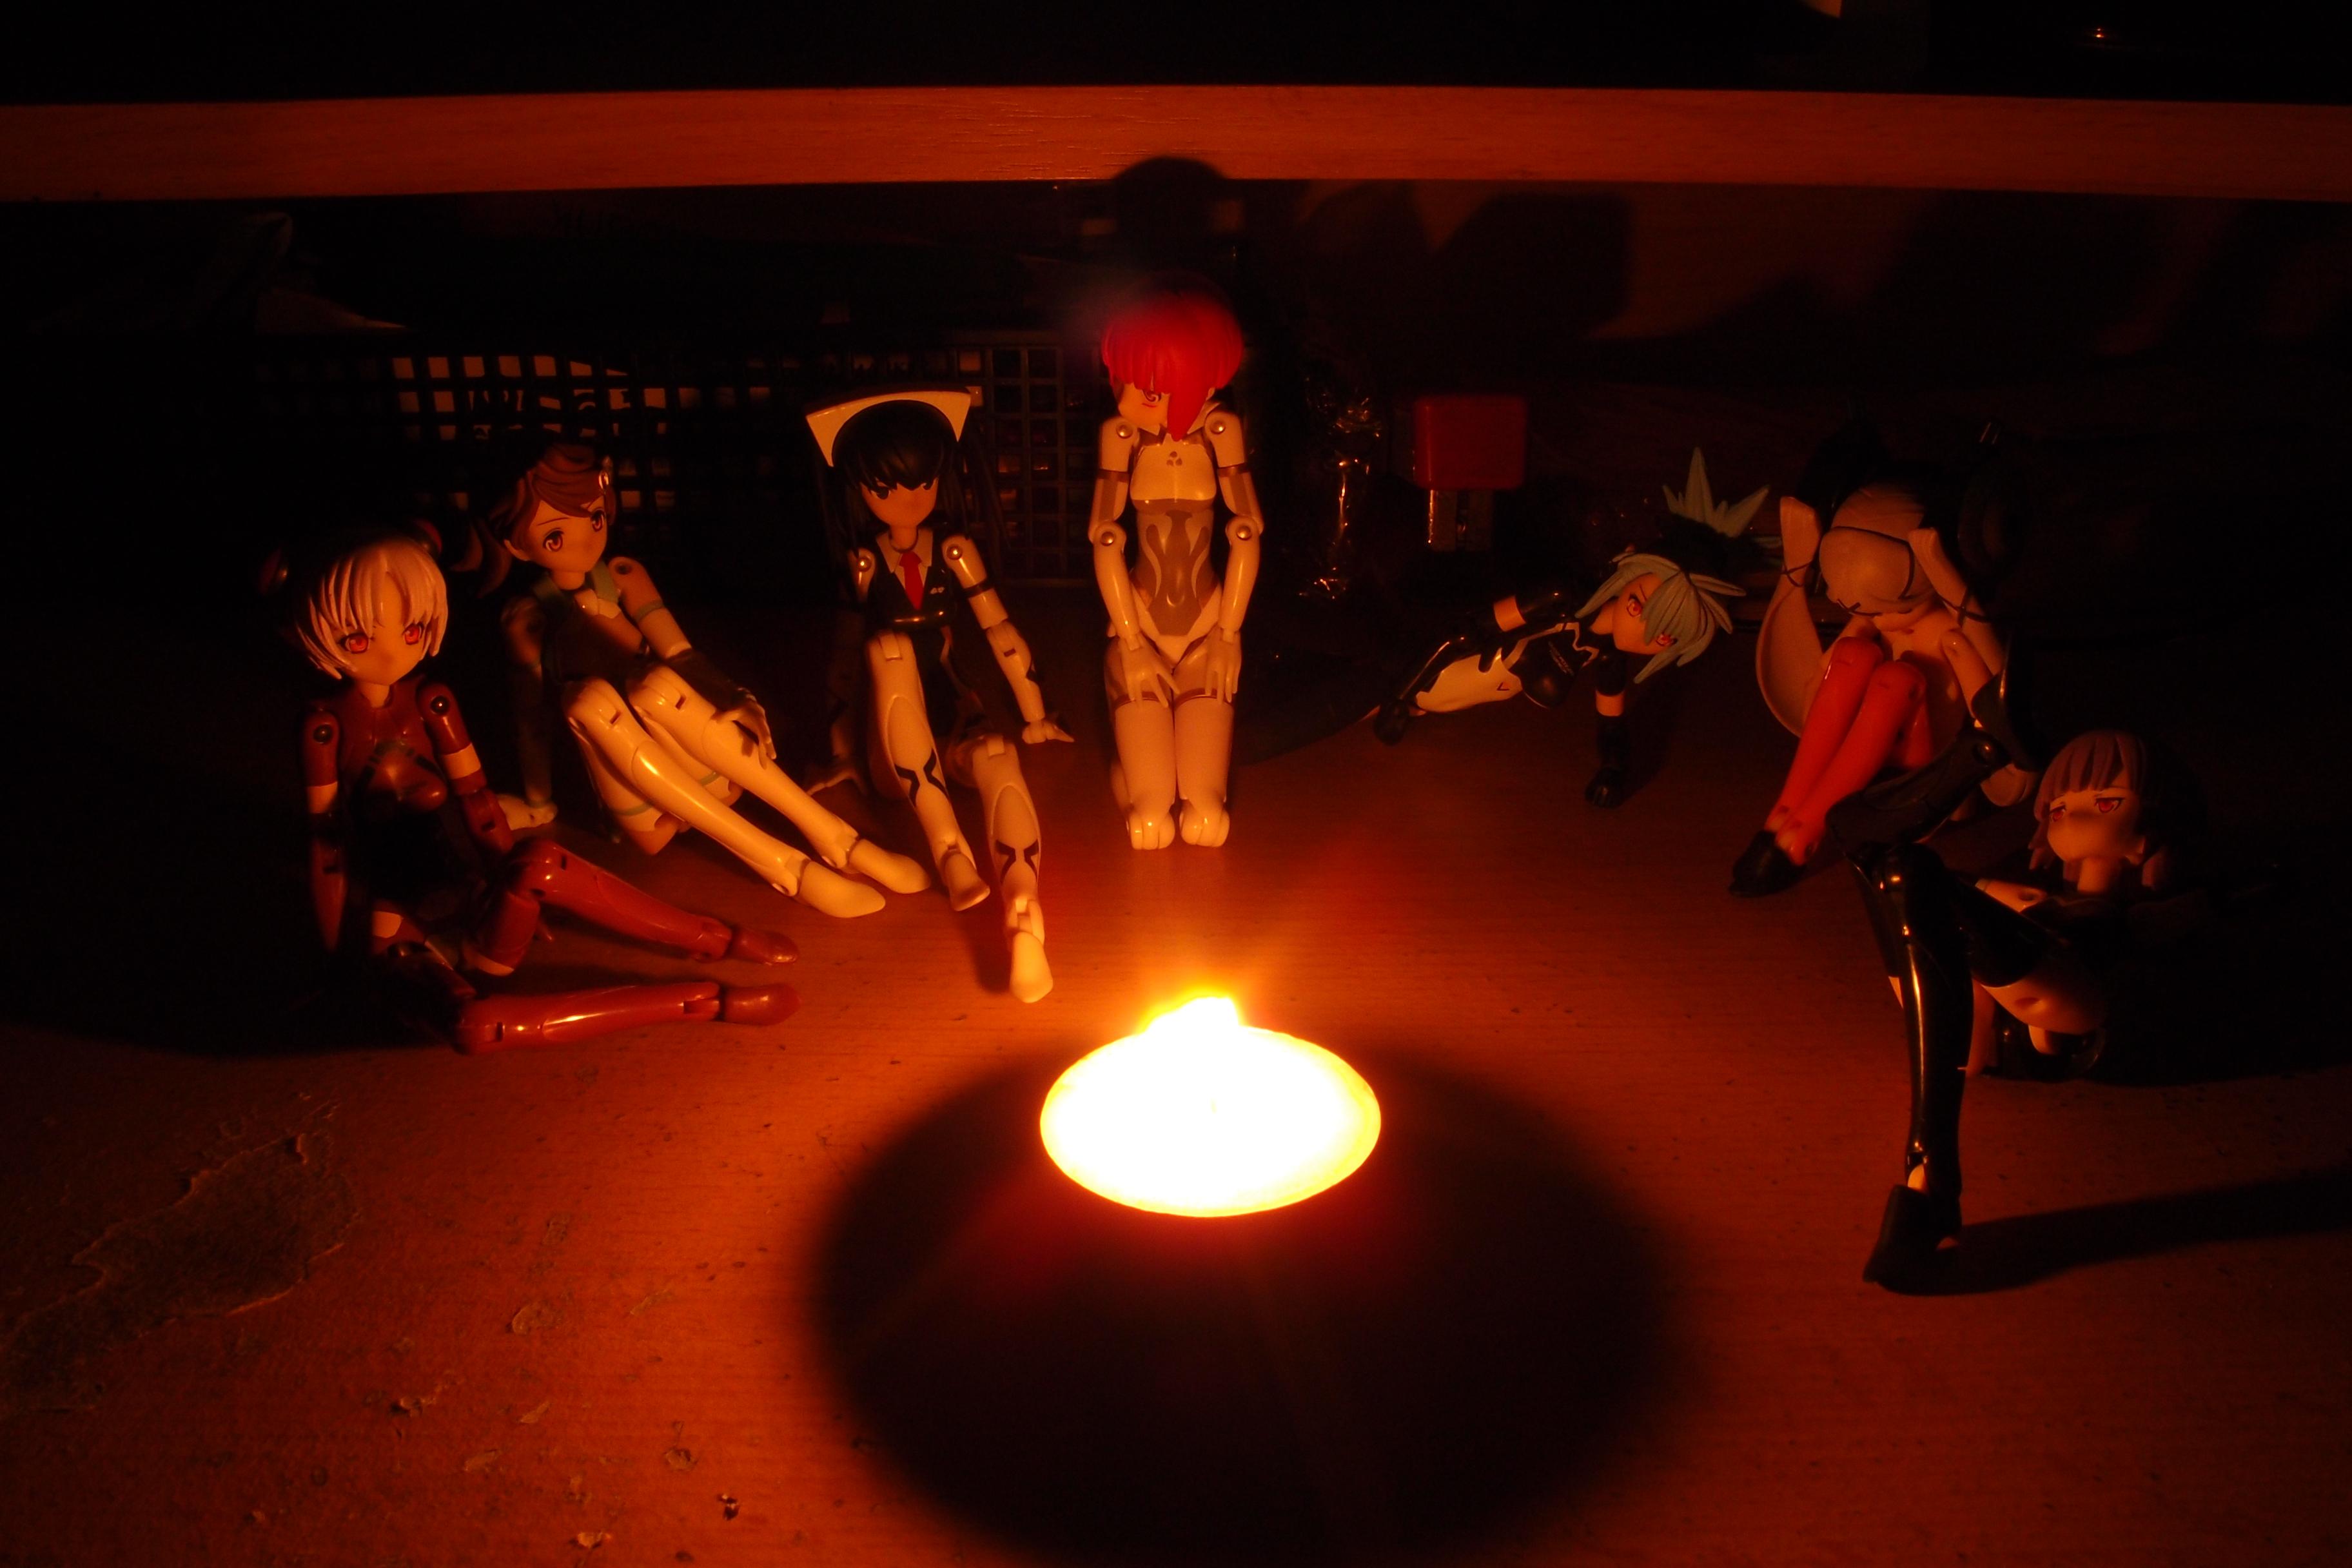 busou_shinki choco konami mms proxima mizuki baby_razz nitroplus asai_(apsy)_masaki shimada_humikane zilveren strarf_mk.2_lavina nishii maryceles_lemuria